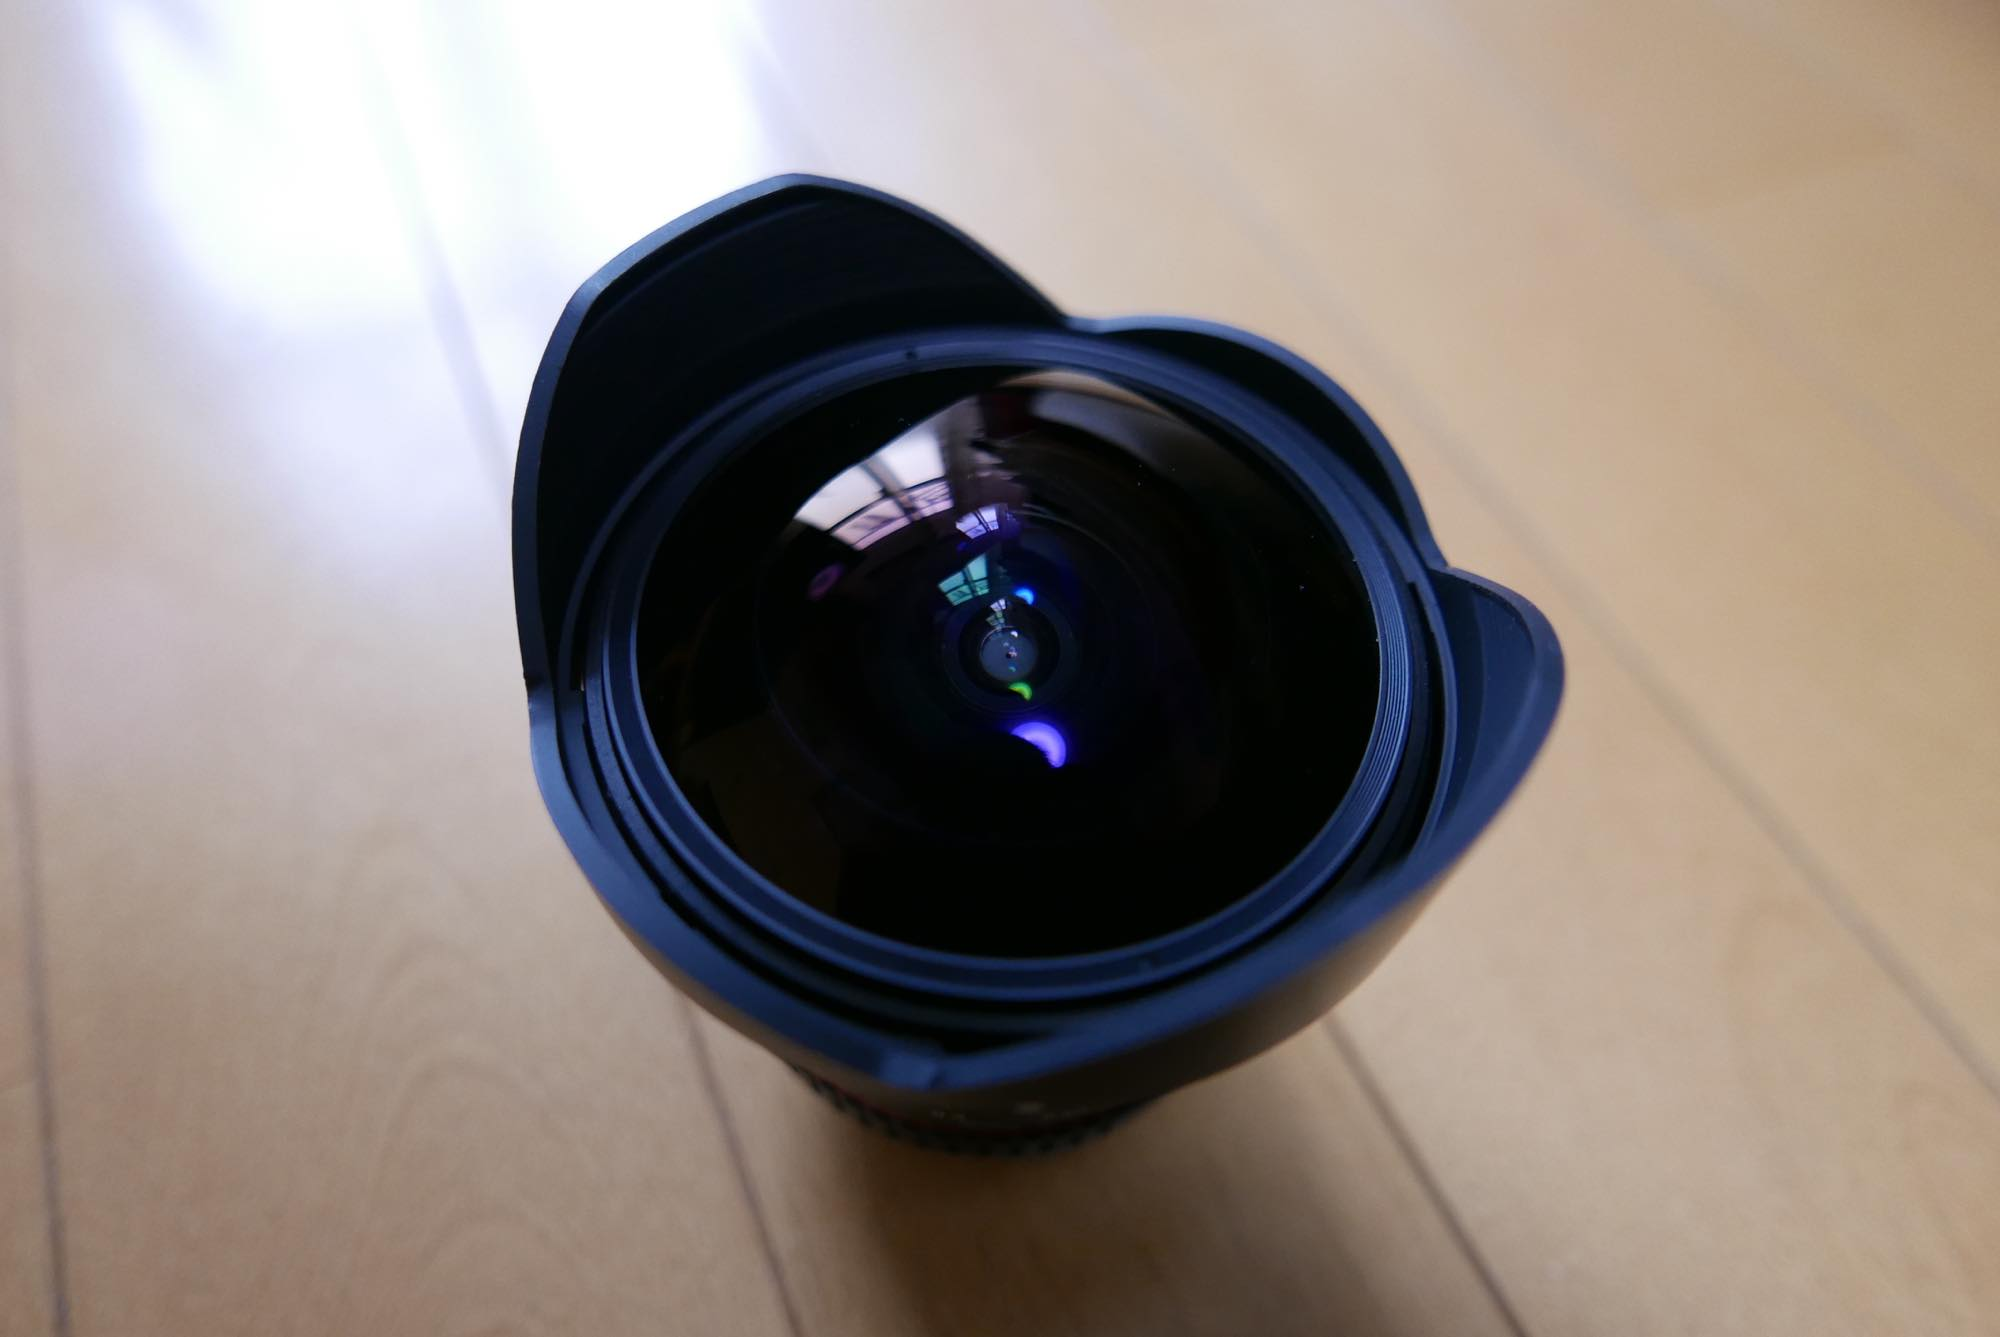 12mm F2.8 ED AS NCS FISH-EYE samyang rokinon 前玉